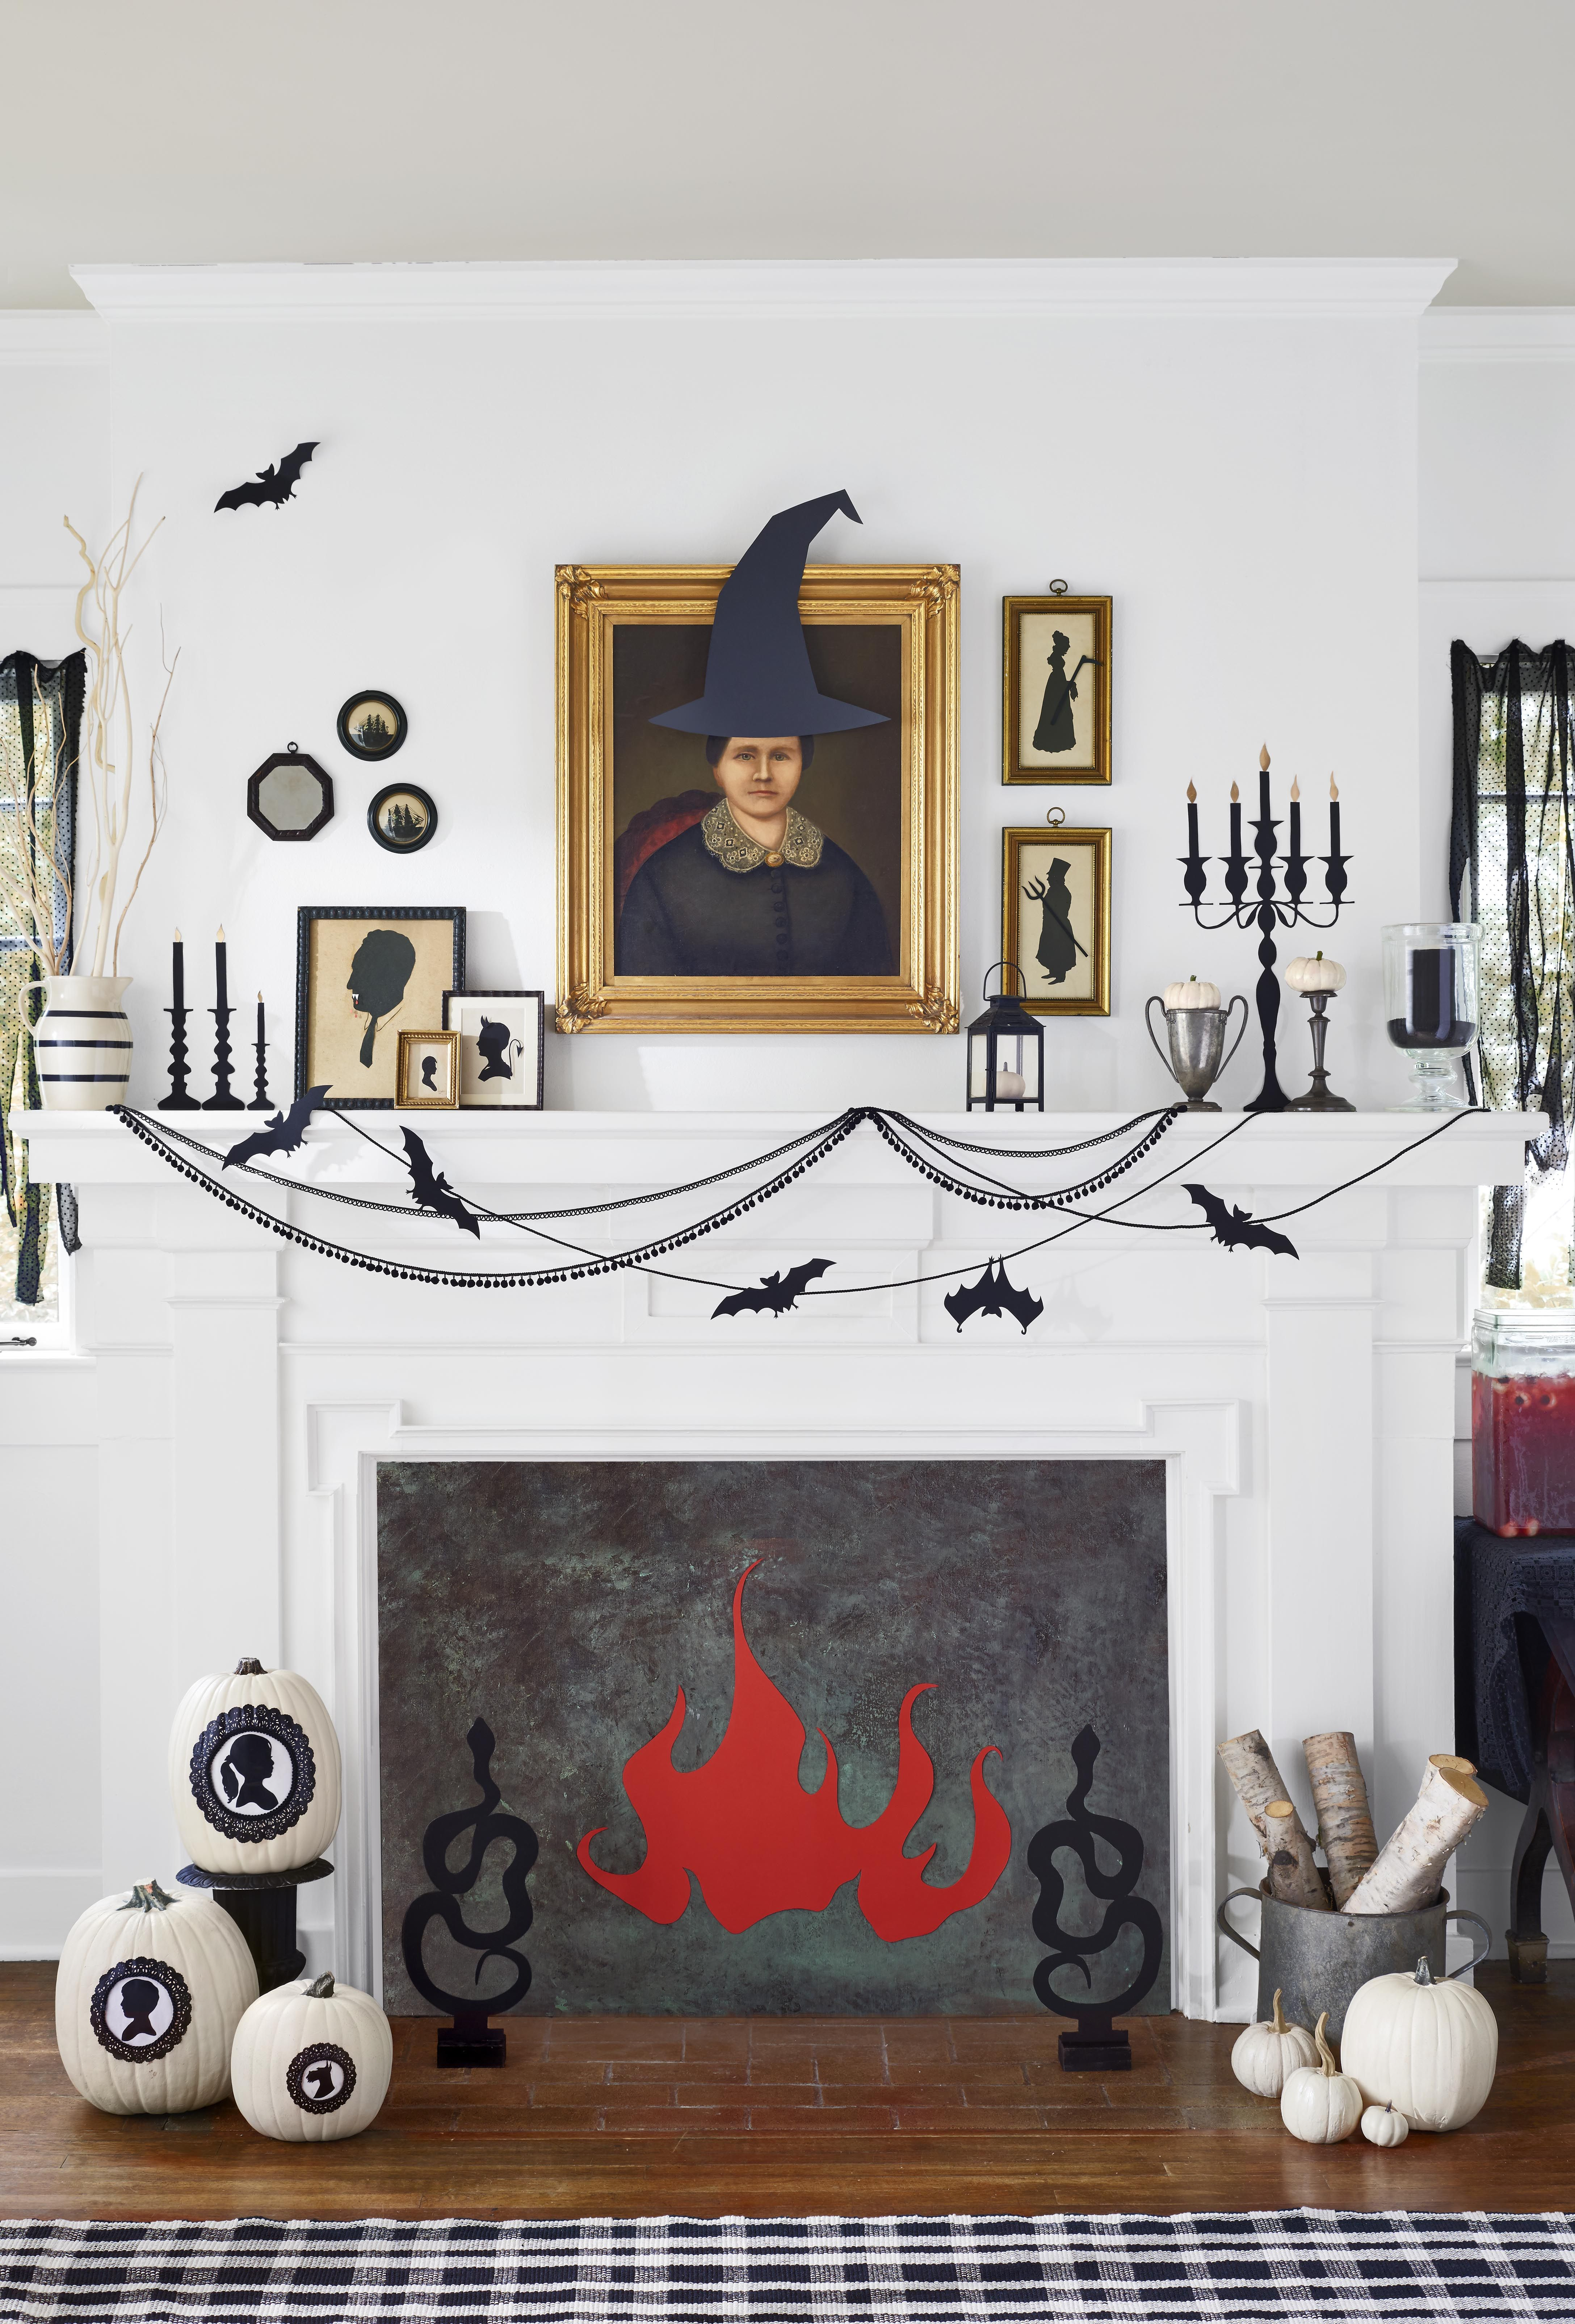 75 Easy Diy Halloween Decorations Homemade Do It Yourself Halloween Decor Ideas